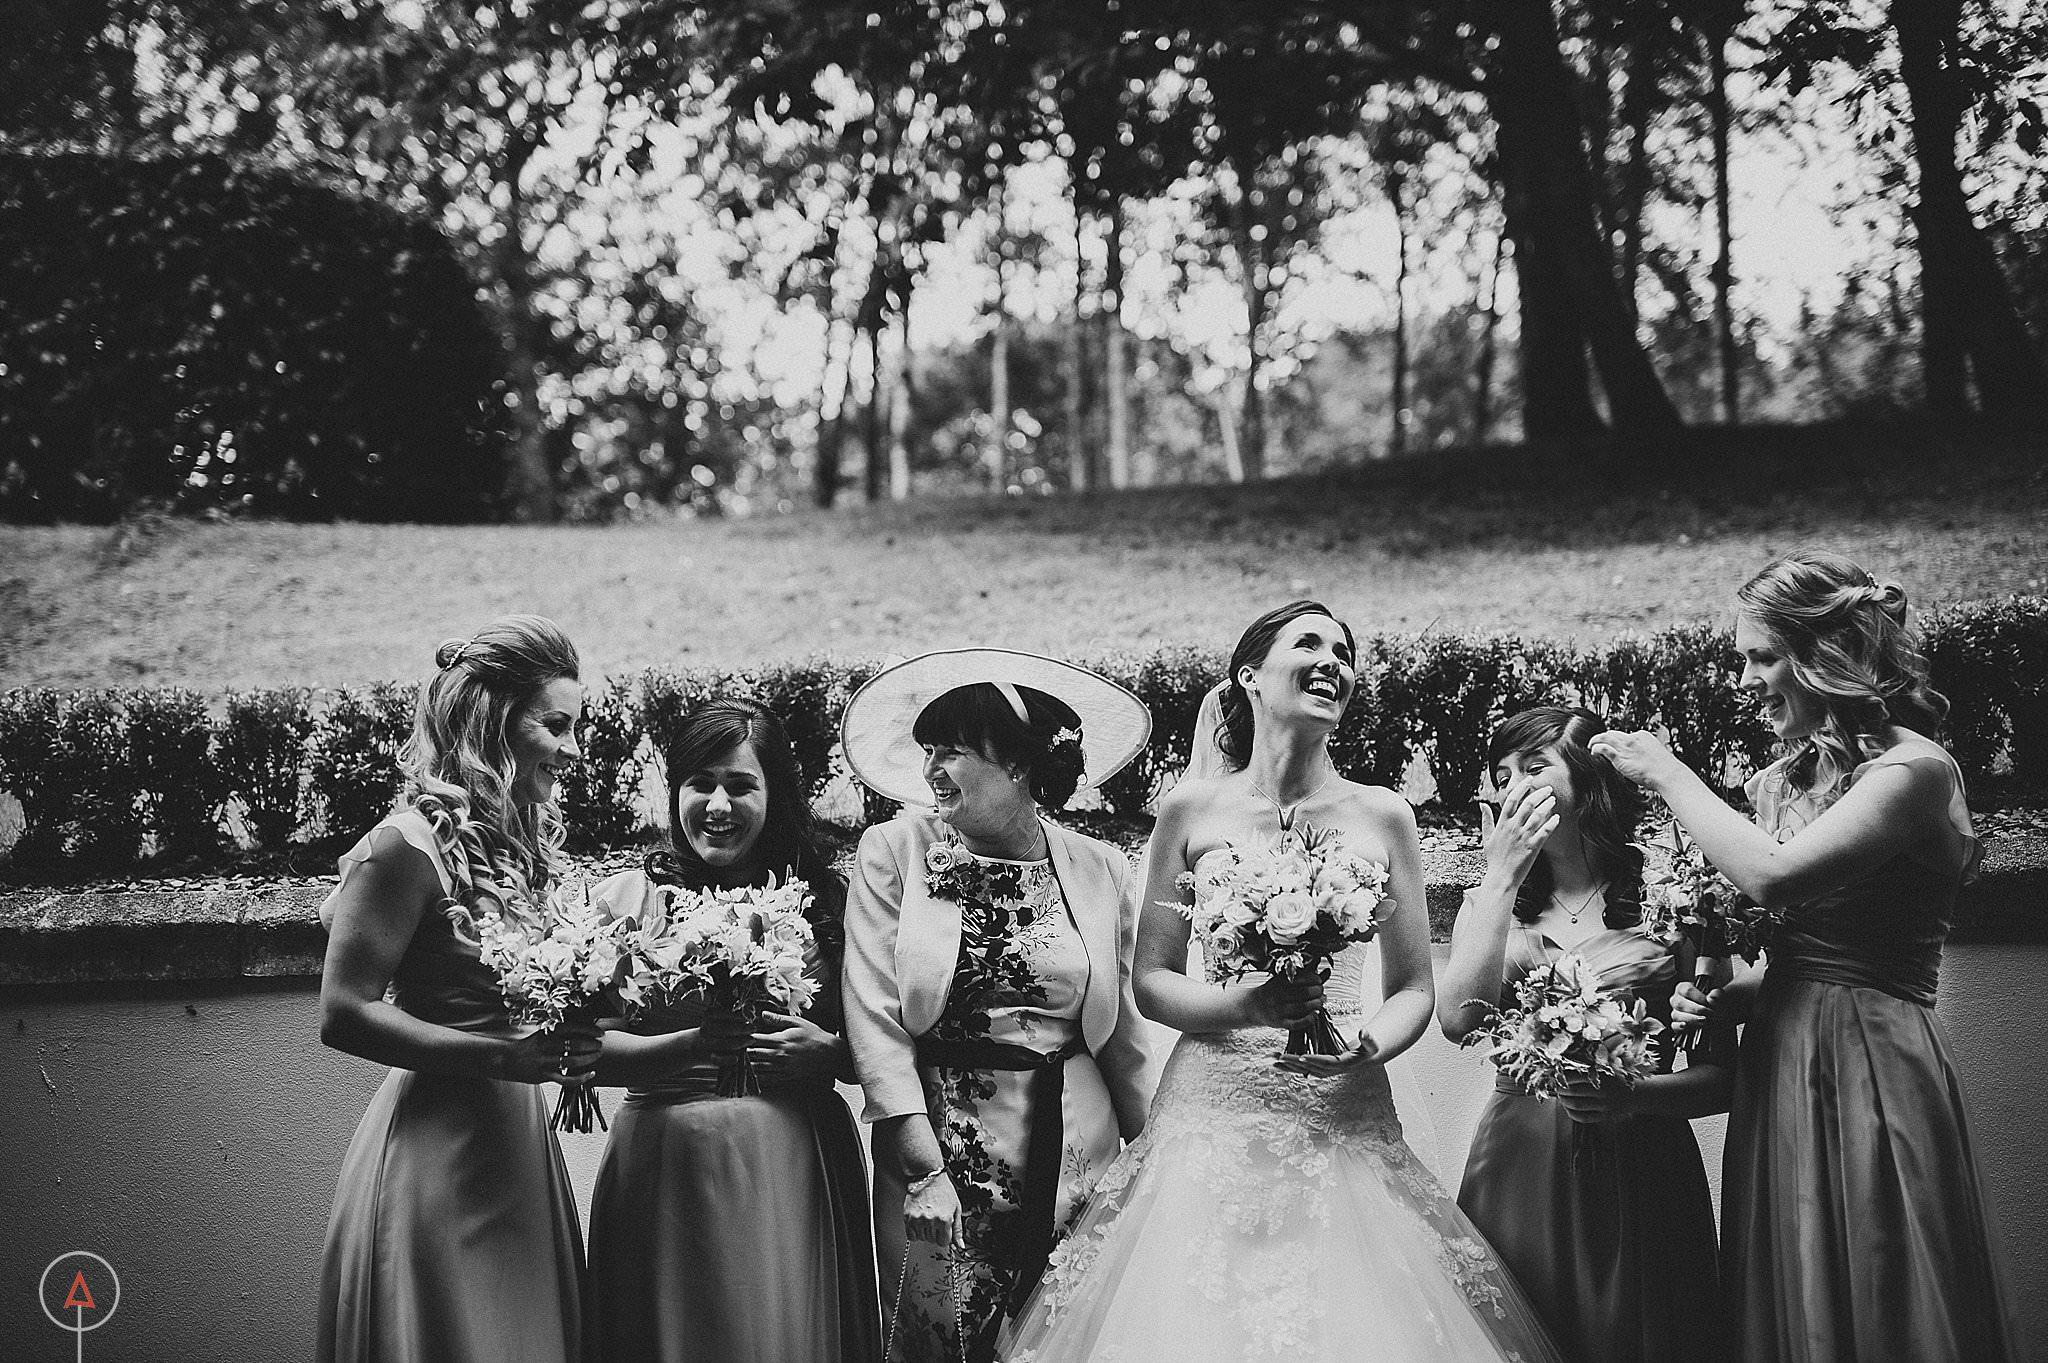 st-donats-llantwit-major-wedding-photography_0010